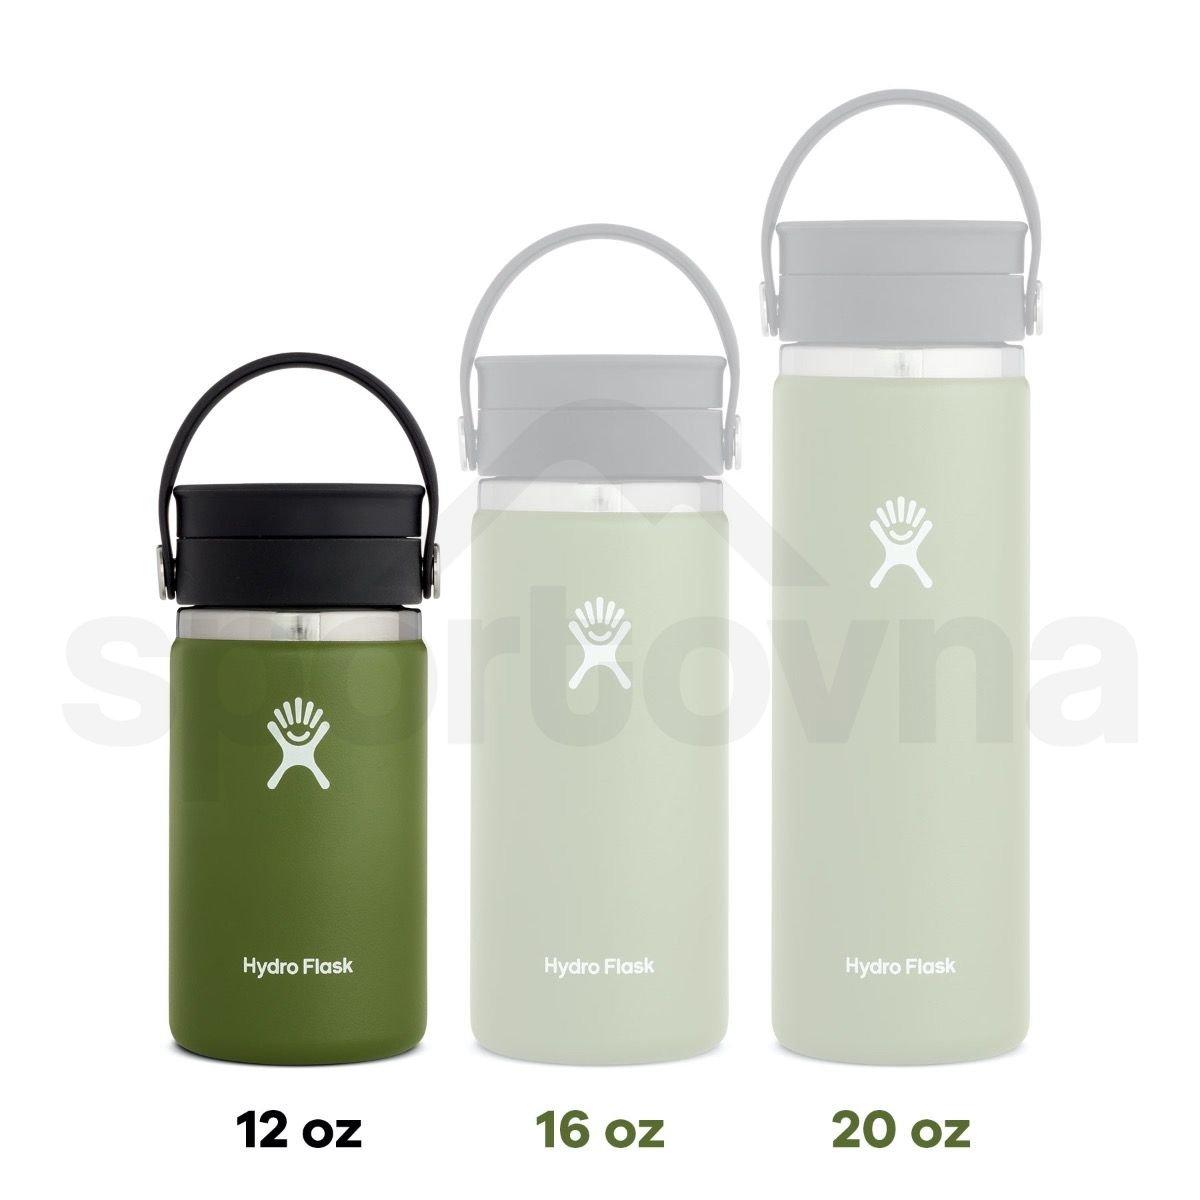 Termohrnek Hydro Flask Coffee Wide Mouth Flex Sip Lid 12 oz - růžová